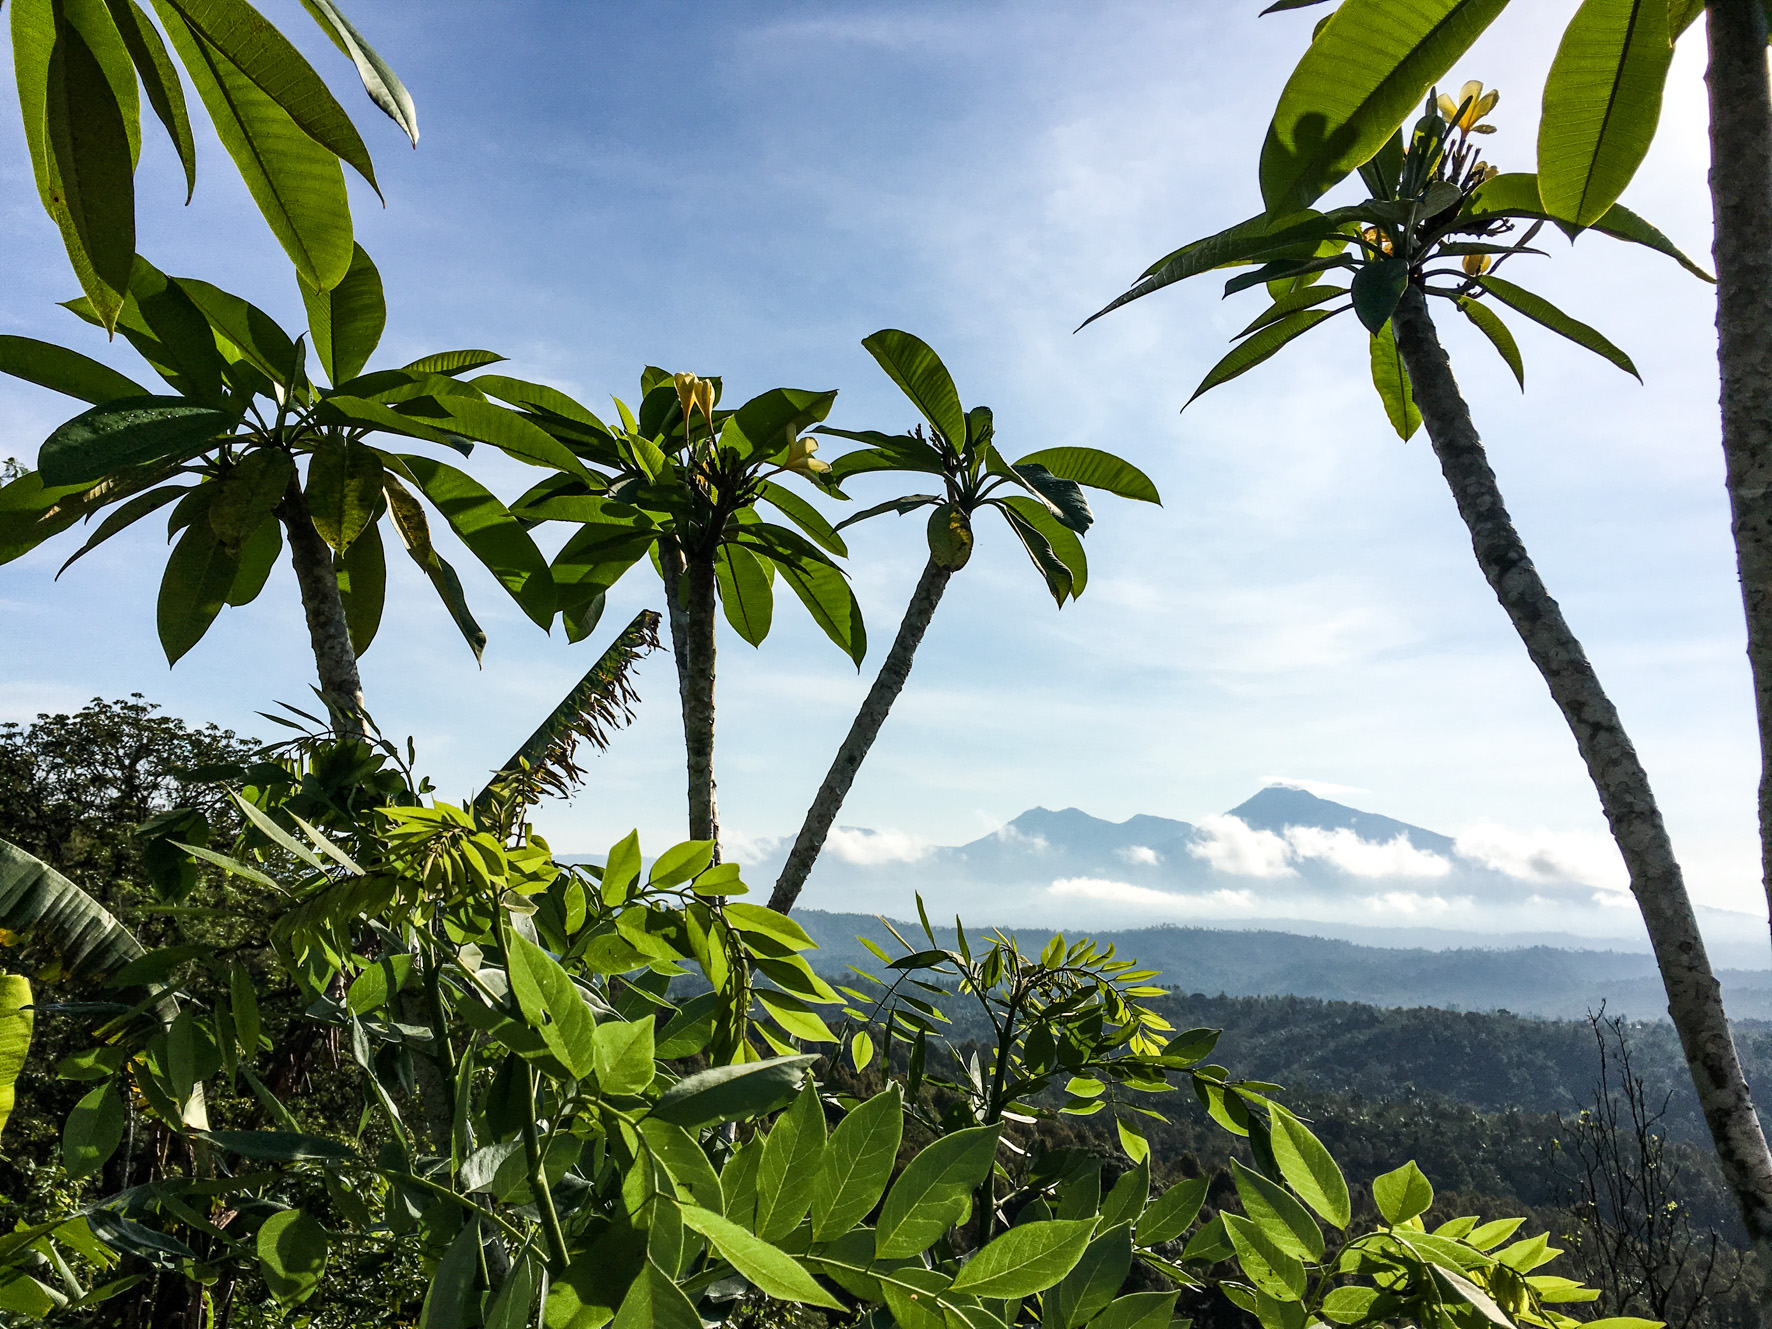 West Bali Scenic Road